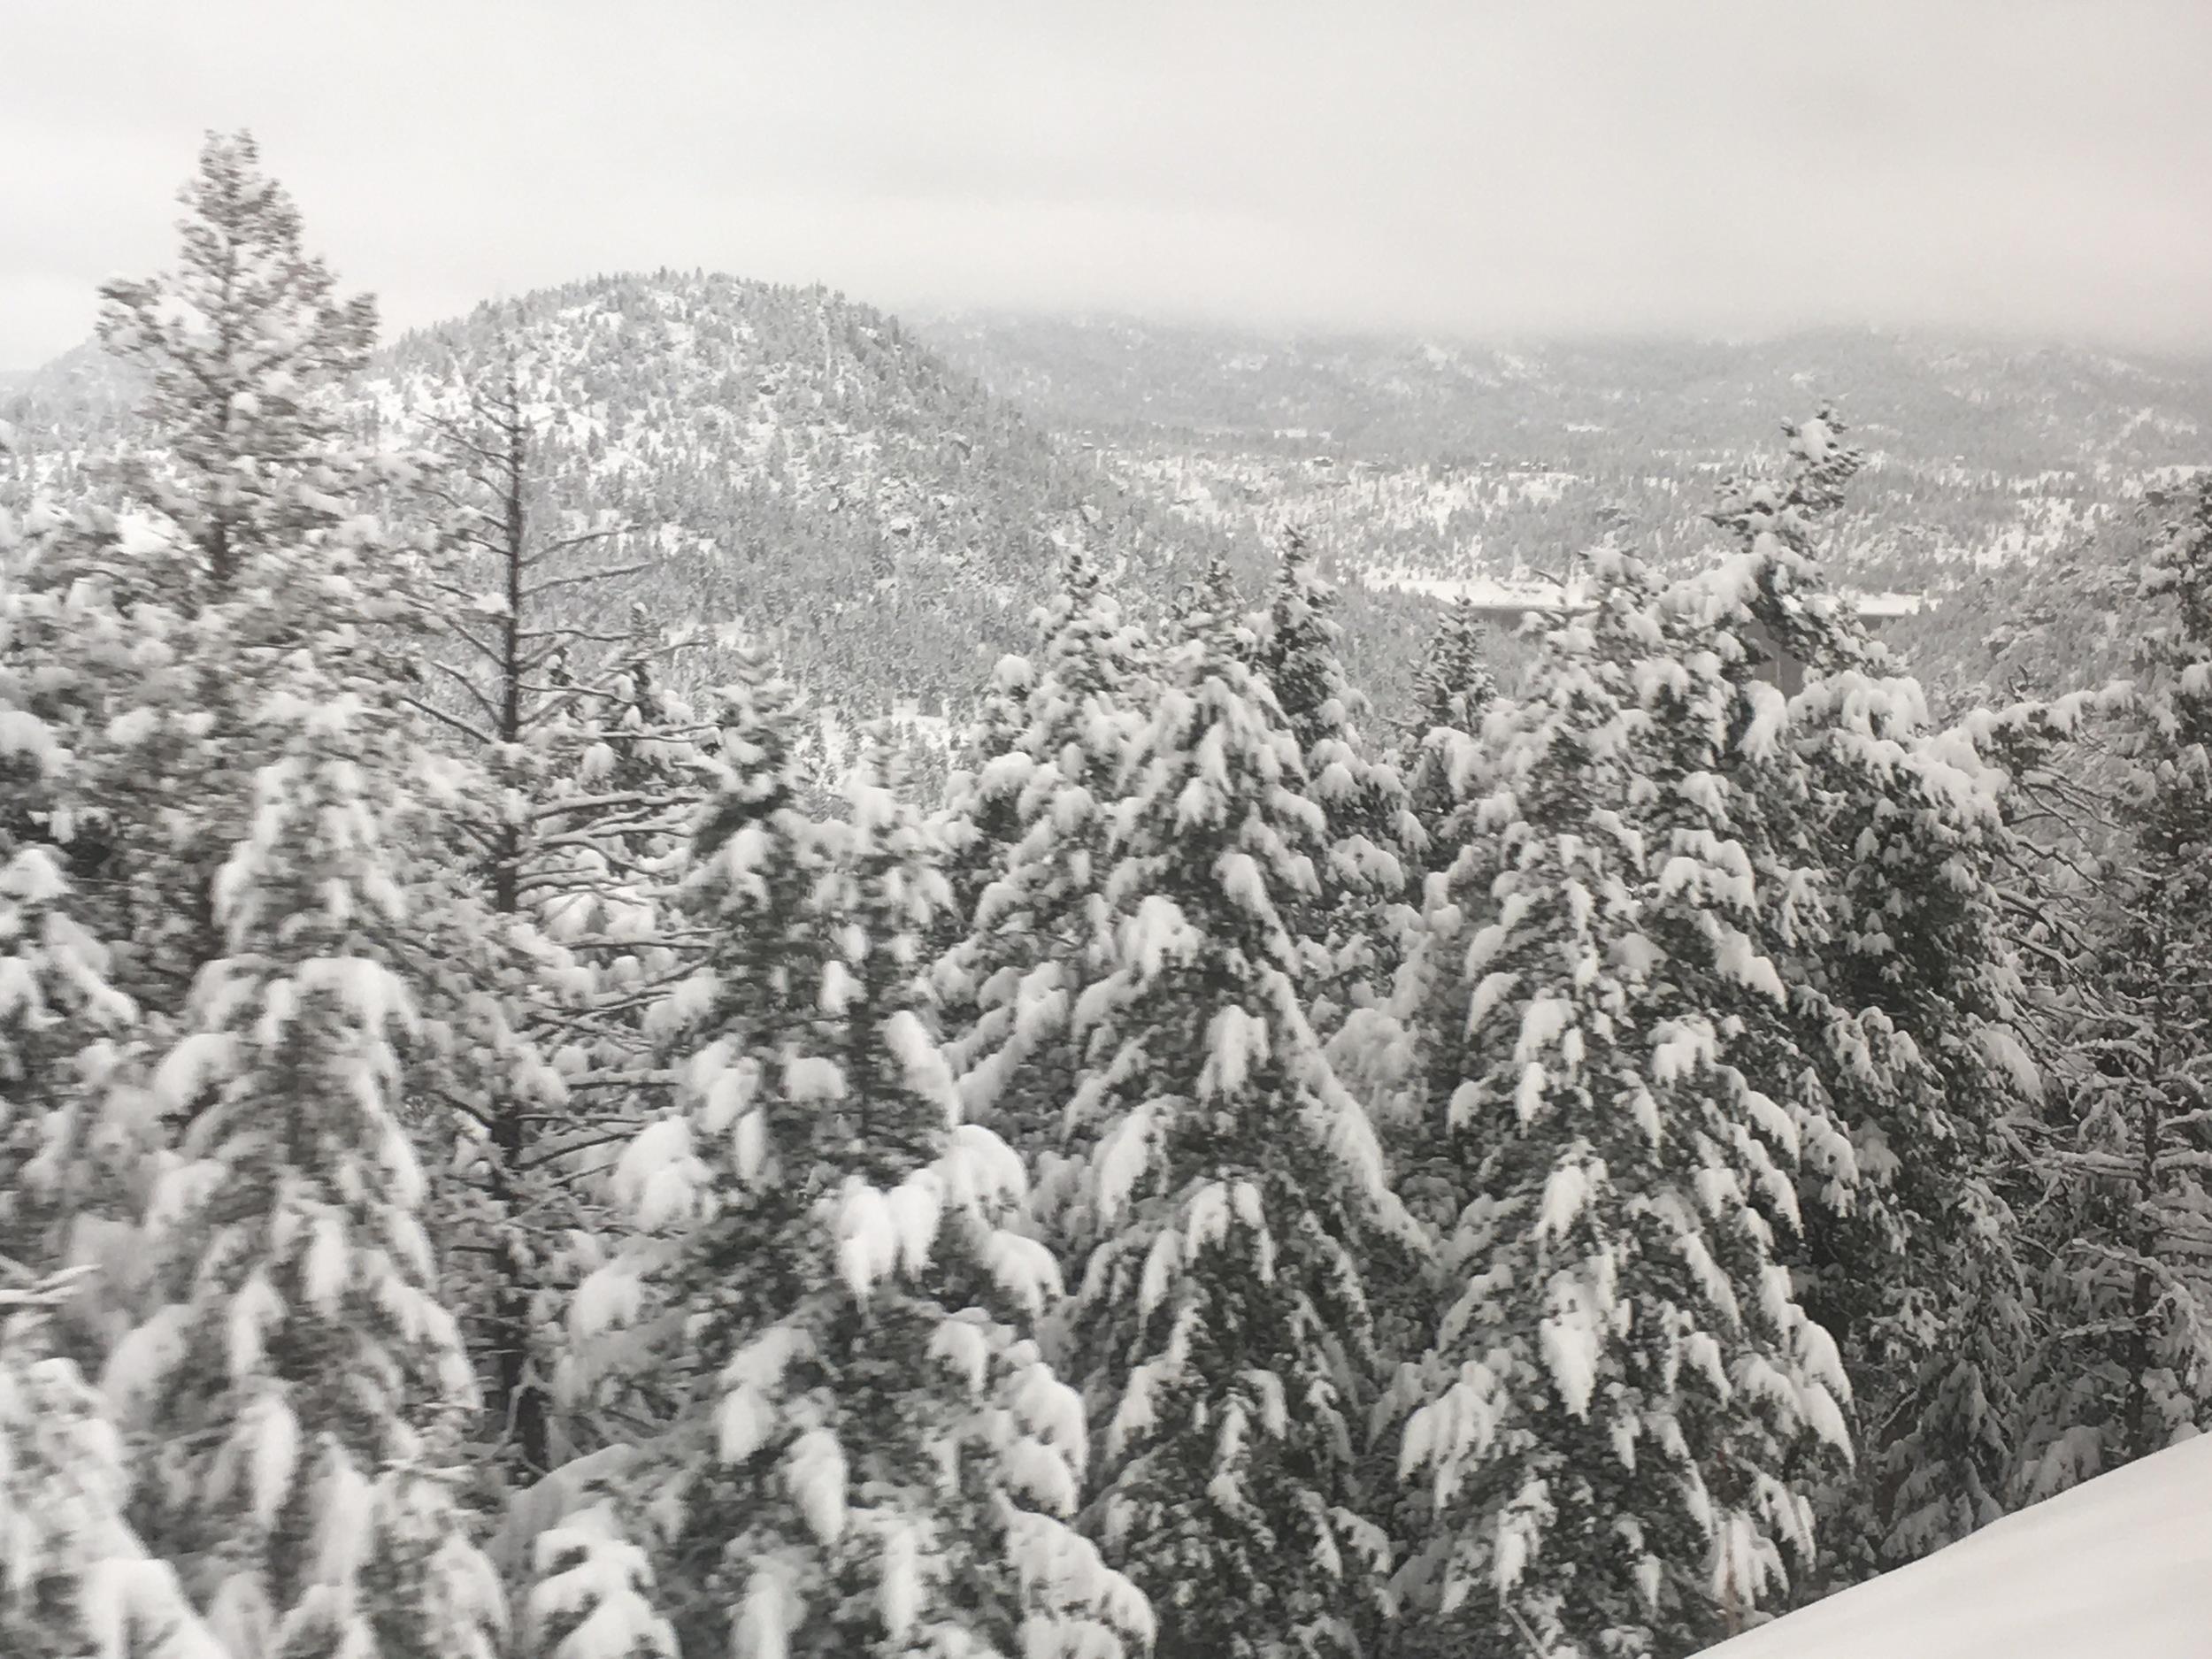 Spring has not sprung in the Rockies.